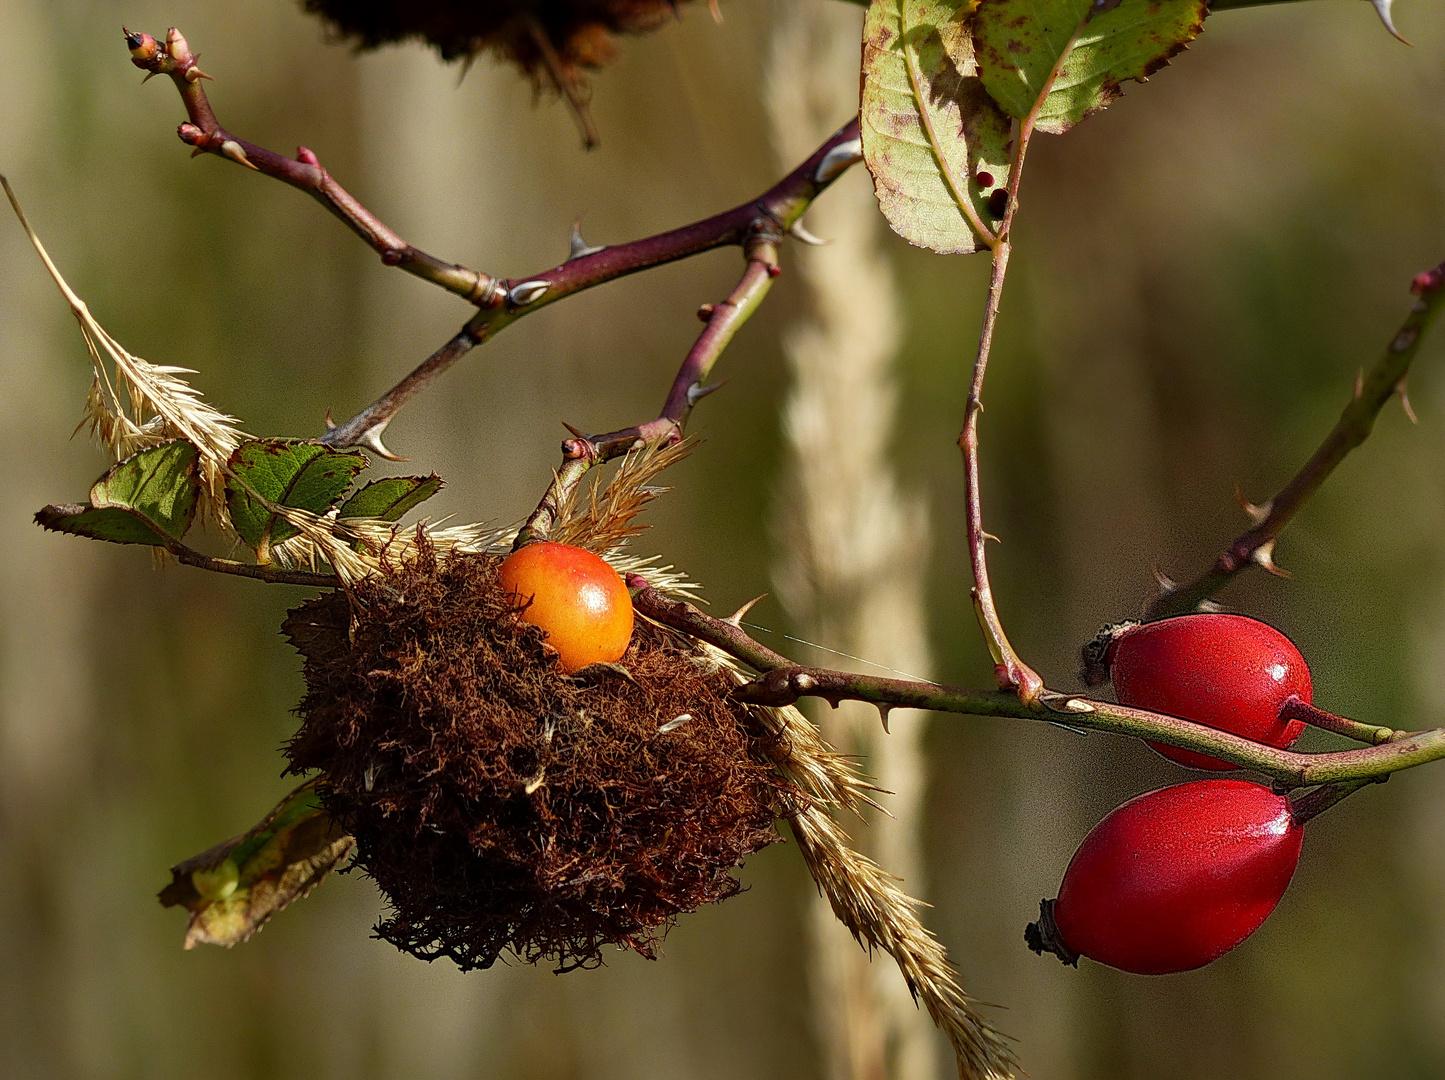 Entdeckung im Herbst